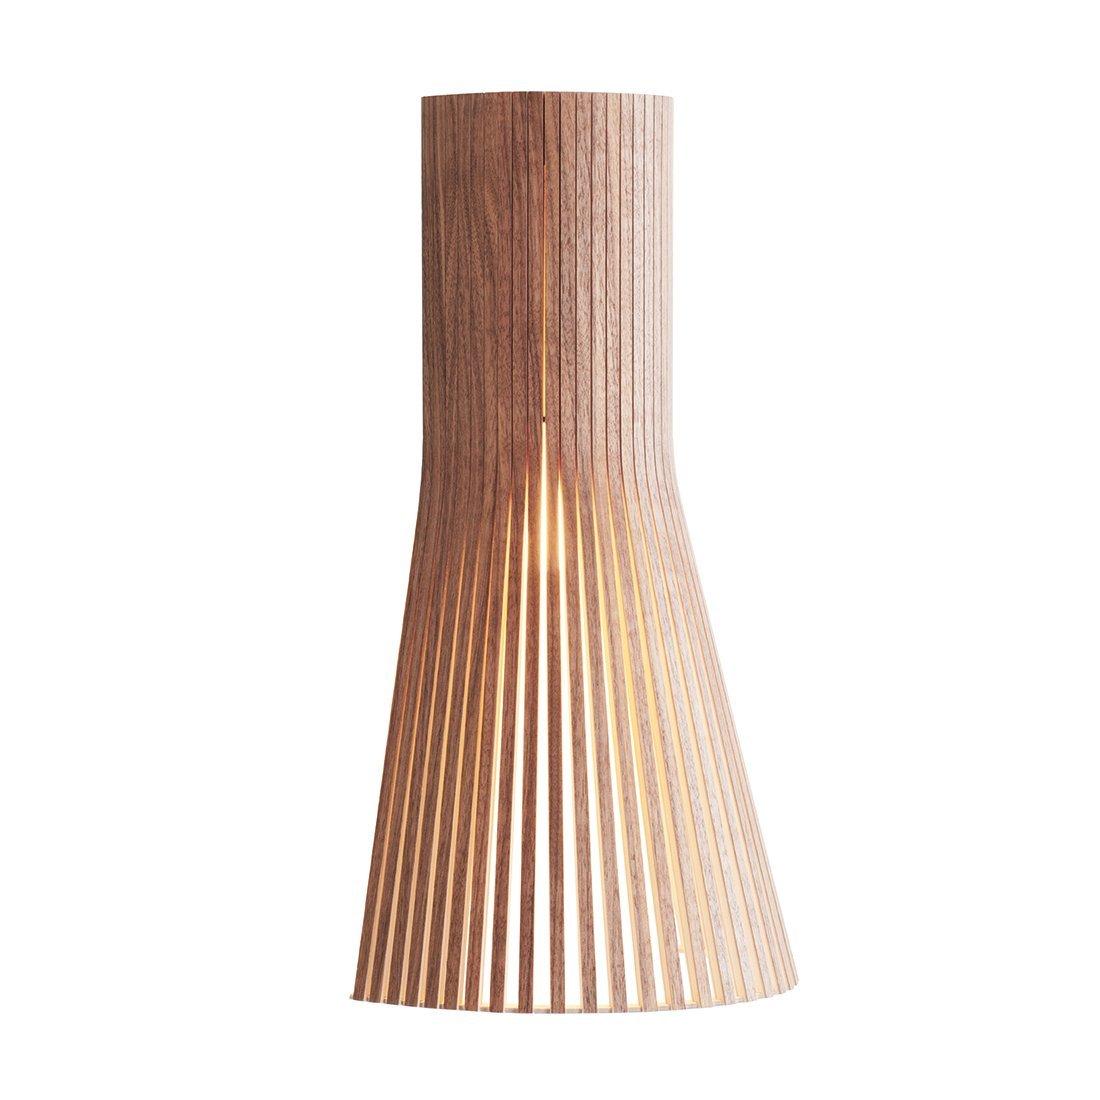 Secto Design Secto 4231 Wandlamp Walnoot Zonder Kabel